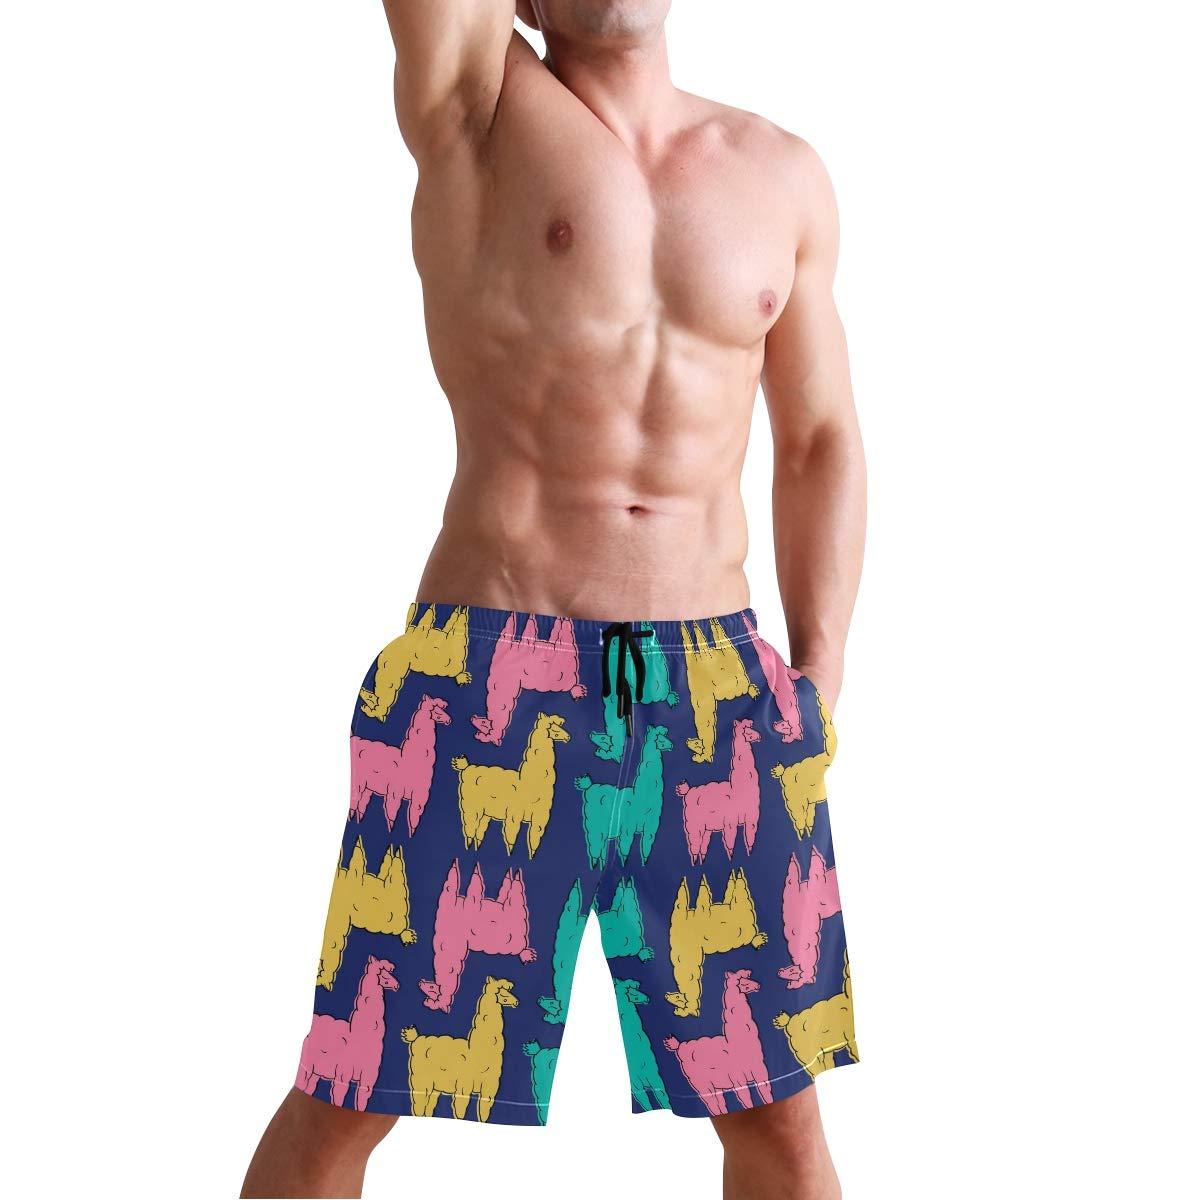 DEYYA Colored Alpaca Summer Beach Shorts Pants Mens Swim Trunks Board Short for Men